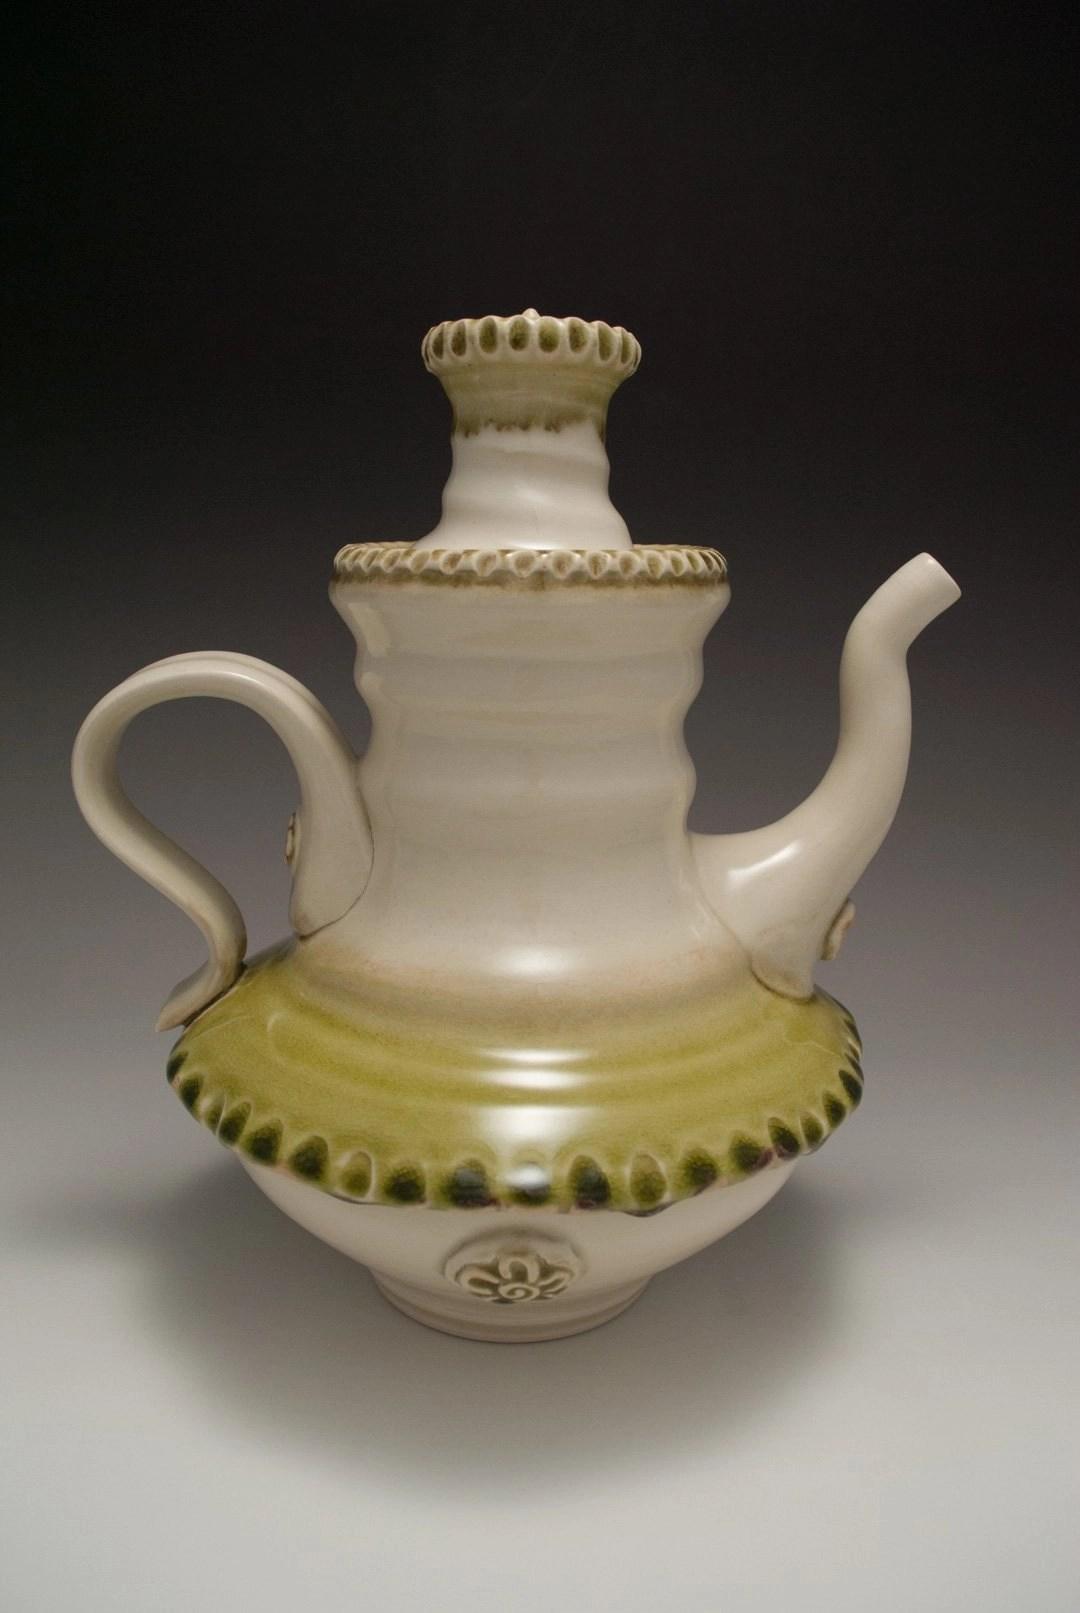 suemcleodceramics-1080w-teapots-2666